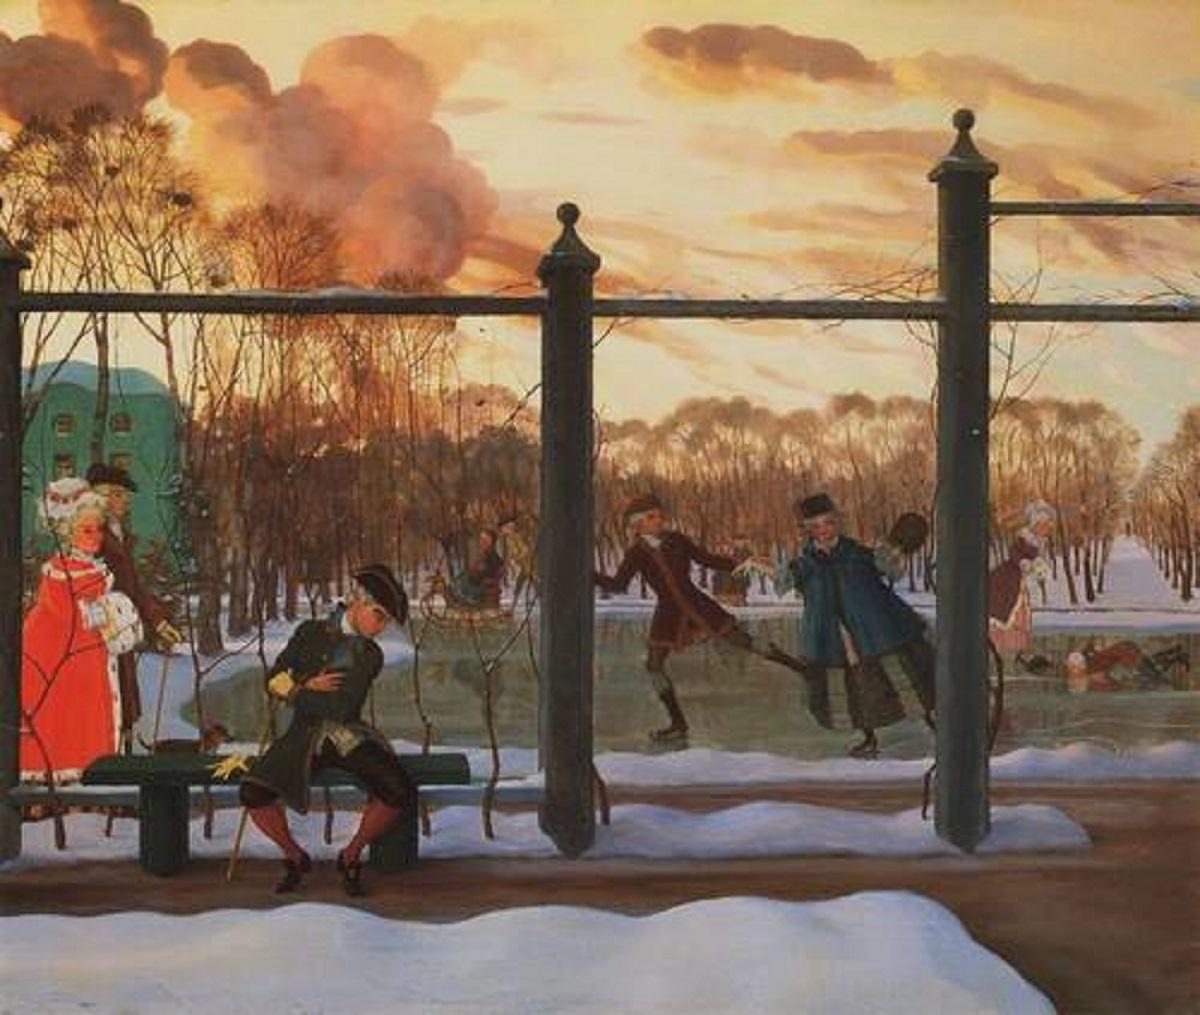 Русский музей: Сомов К. А. Зима. Каток. 1915 г.